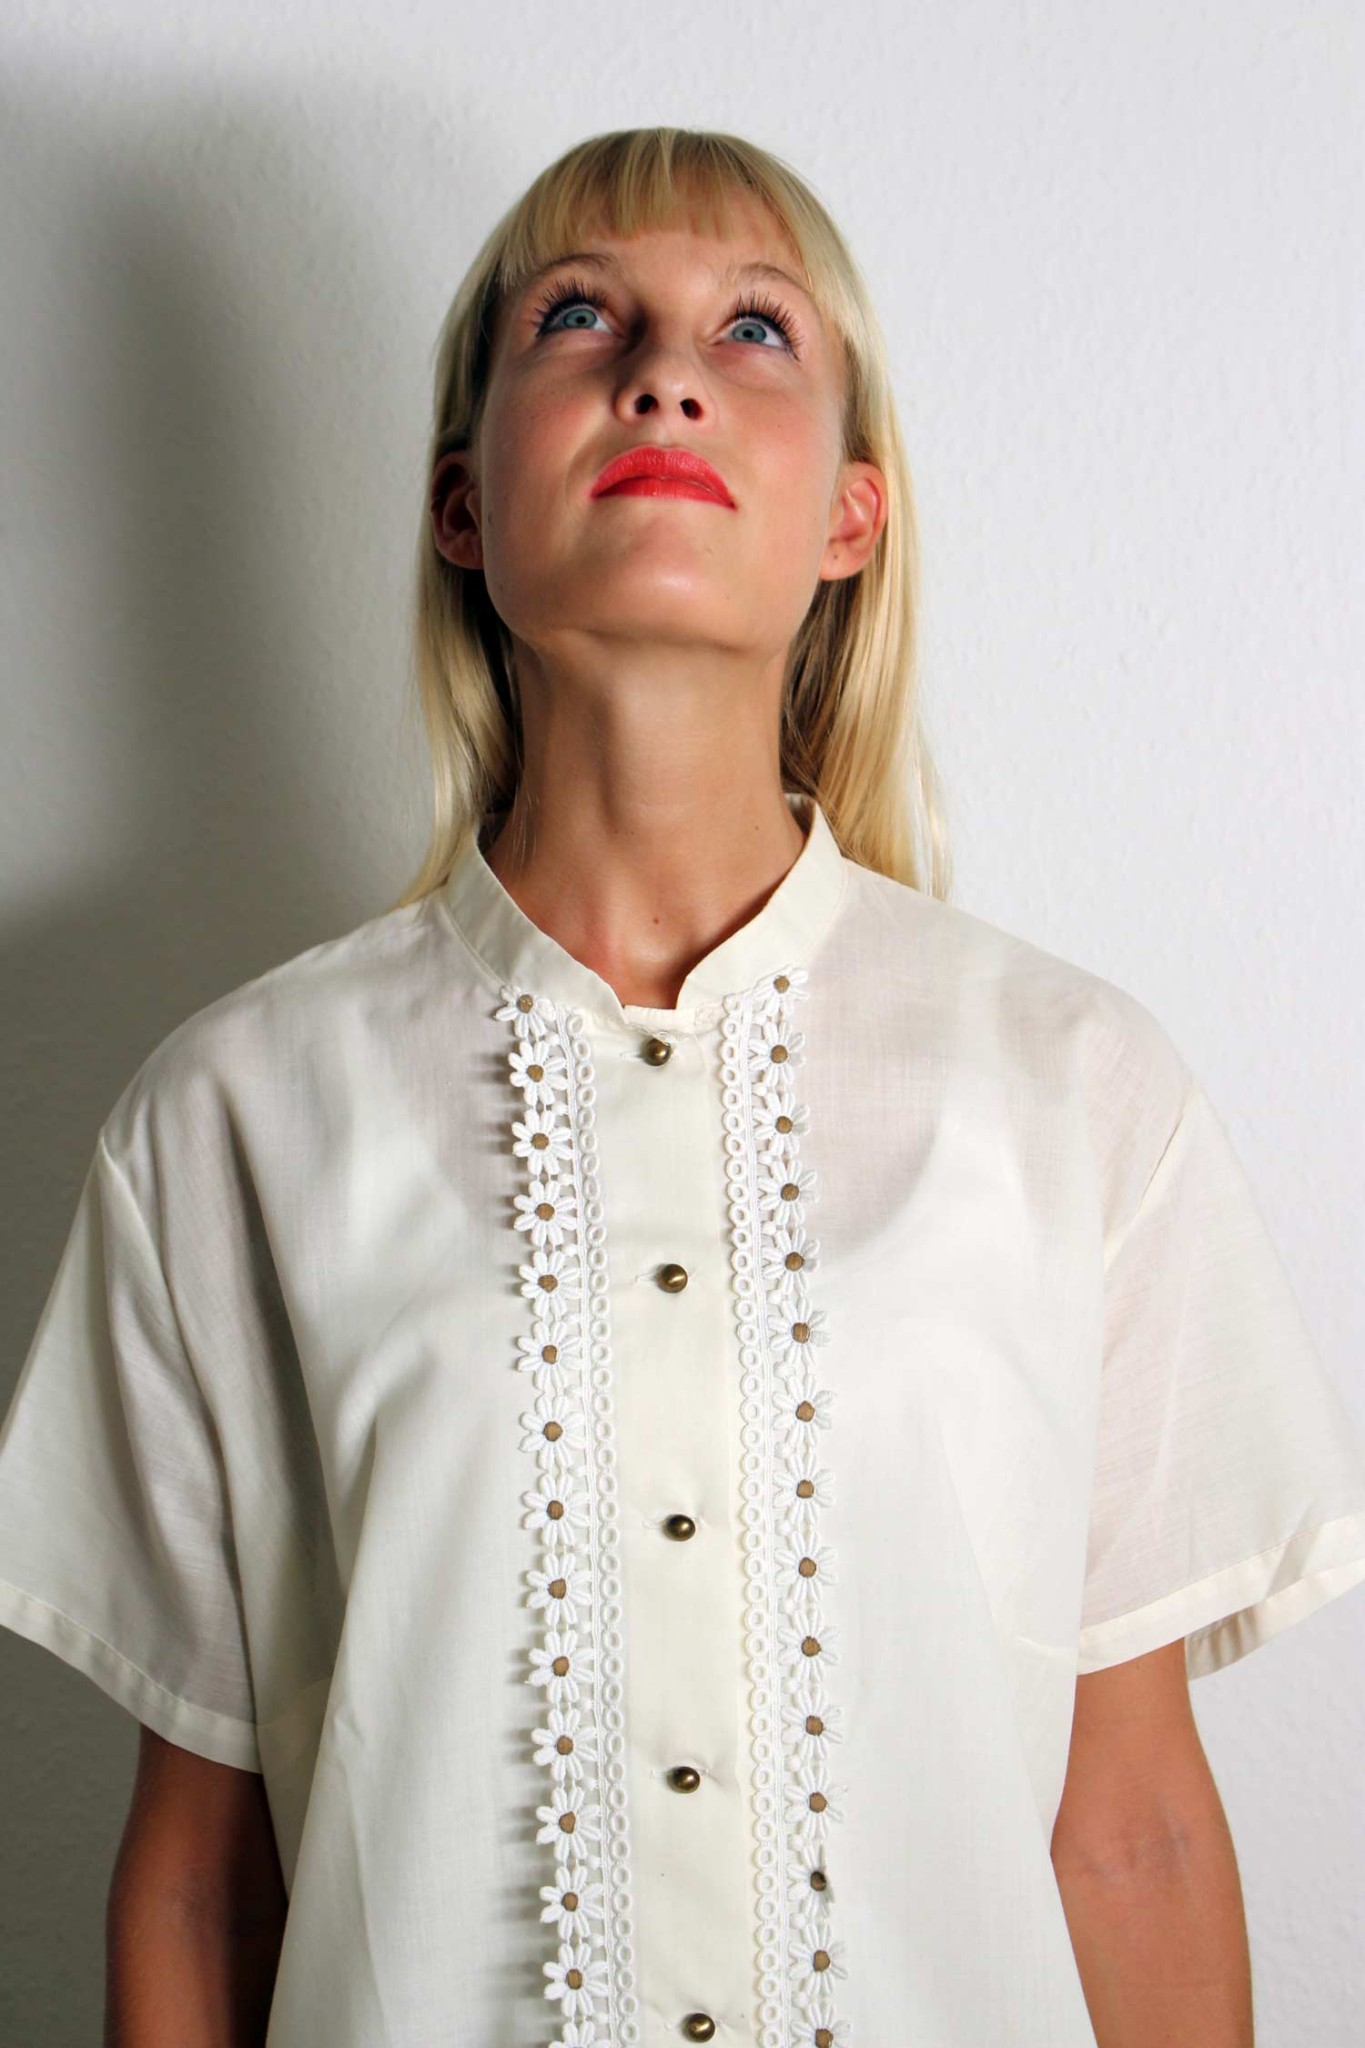 vintage bluse mit spitze briella oma klara. Black Bedroom Furniture Sets. Home Design Ideas